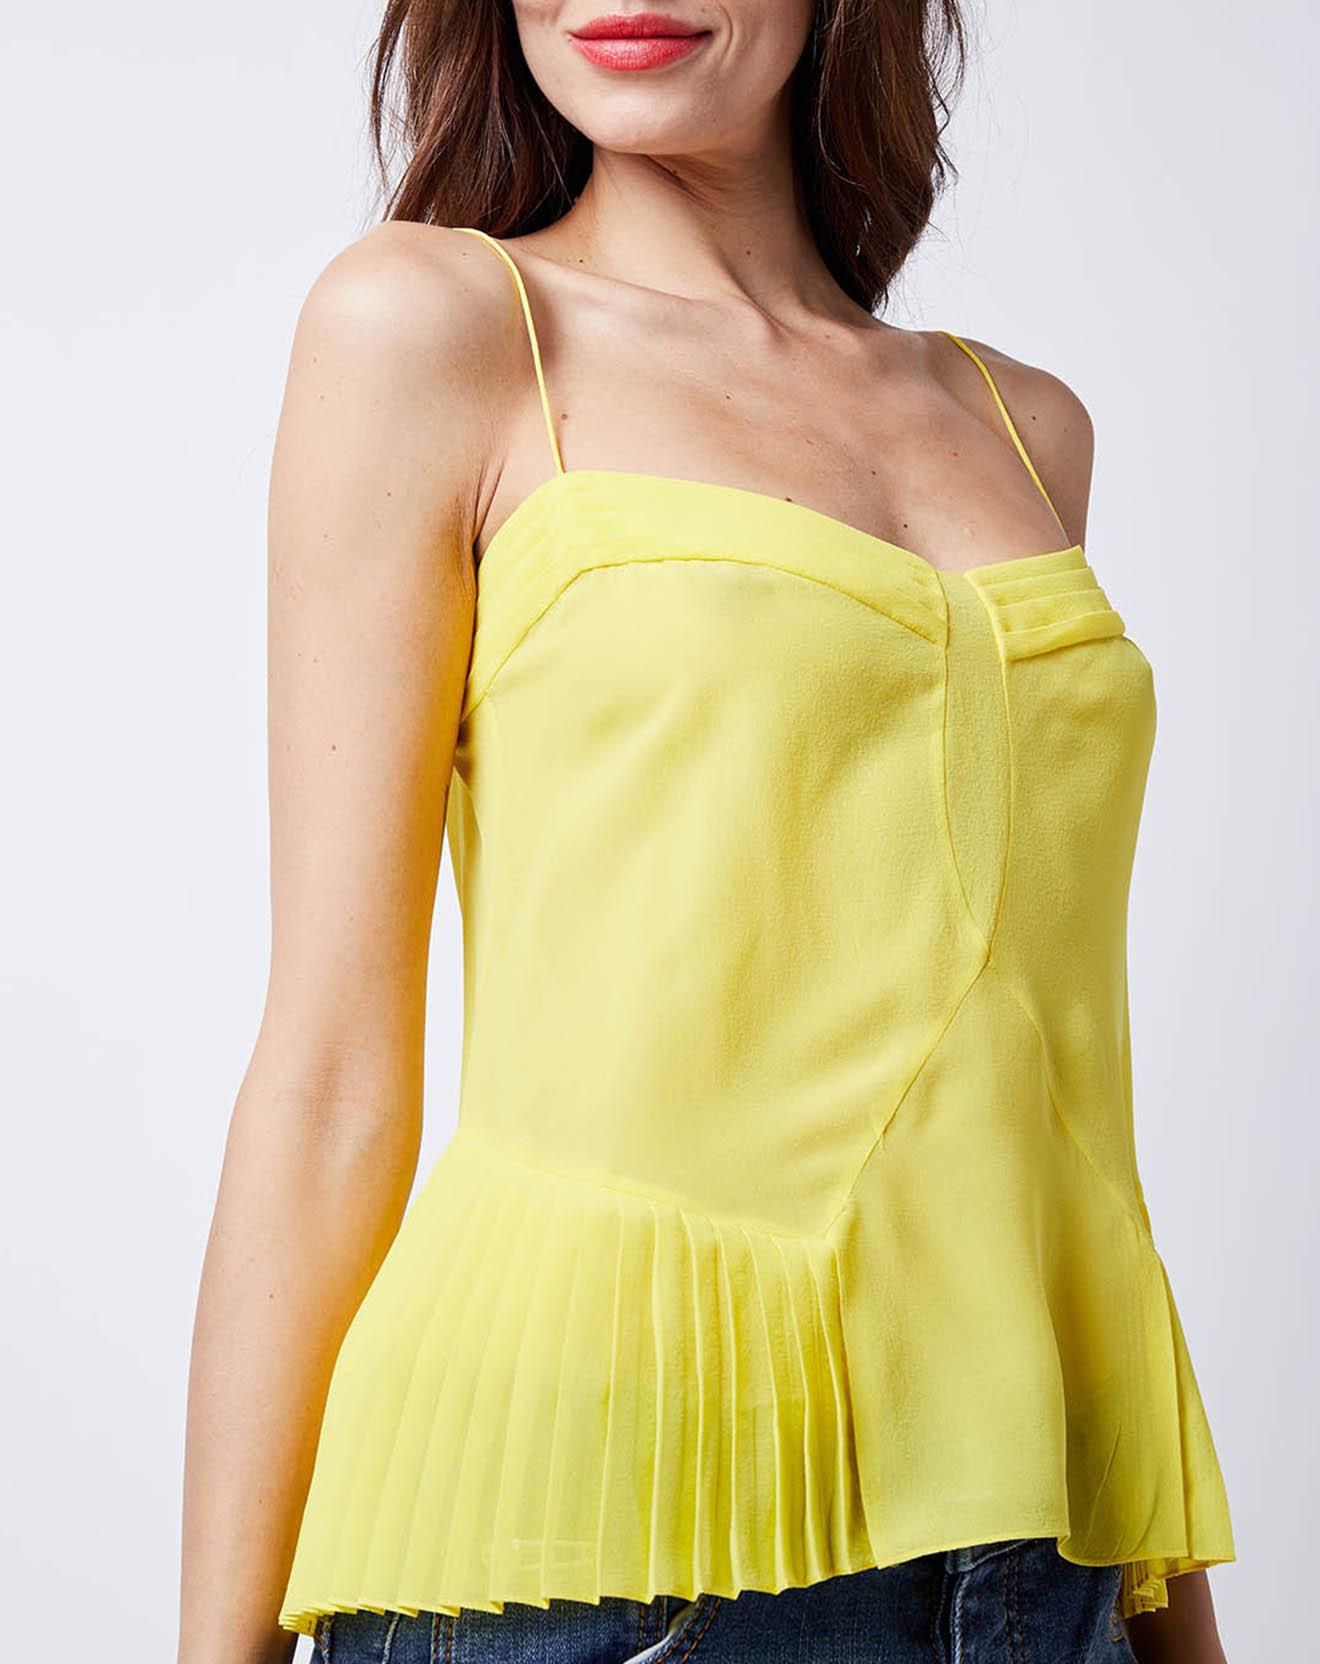 Débardeur 100% Soie à plis jaune - John Galliano - Modalova